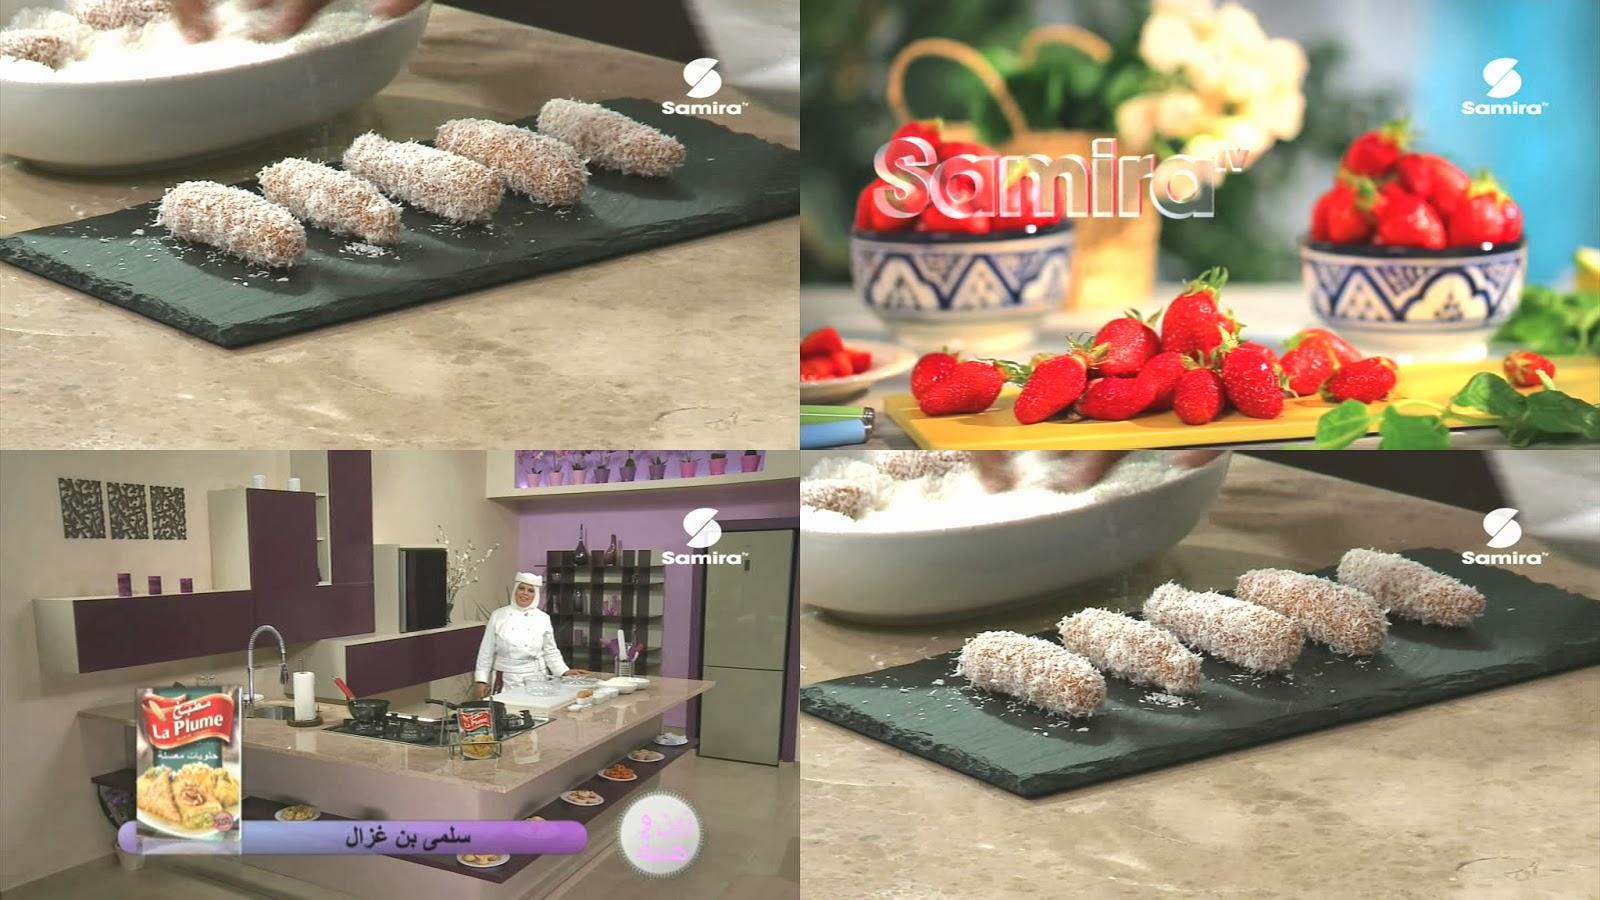 La cuisine alg rienne sbi3at la3roussa for Samira tv cuisine